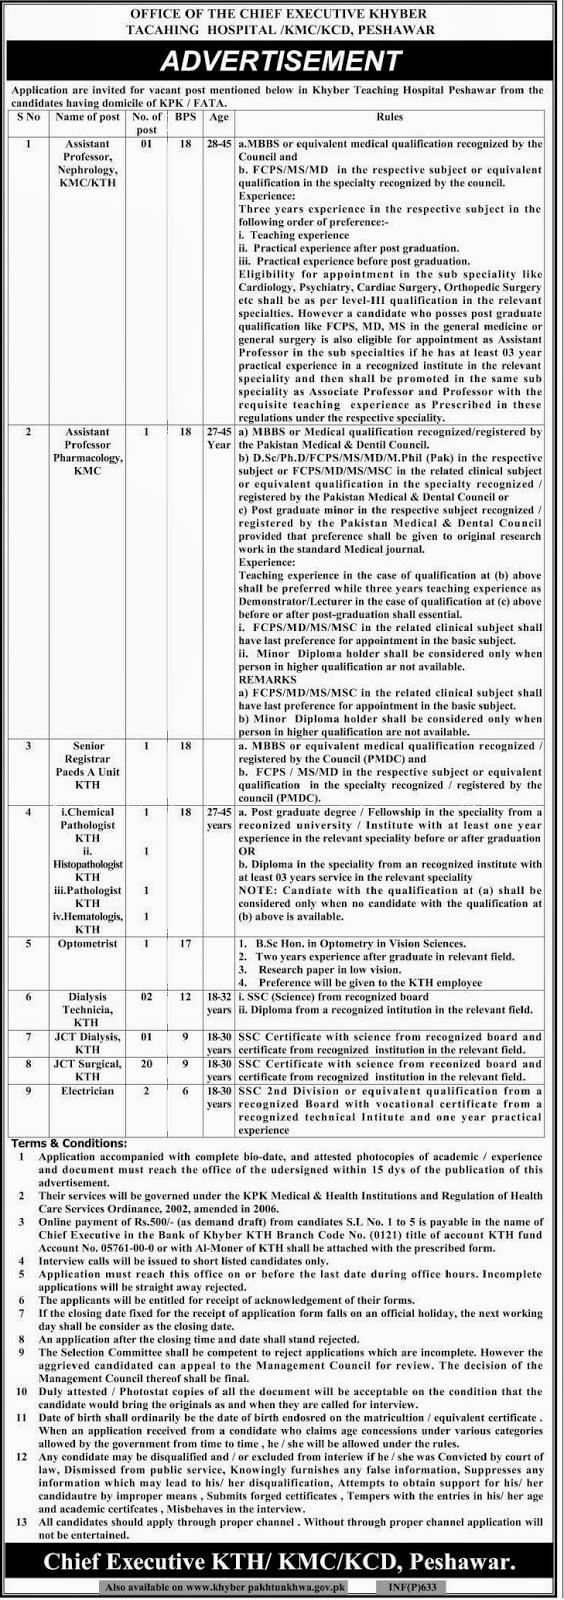 Vacancies in Khyber Teaching Hospital, Peshawar